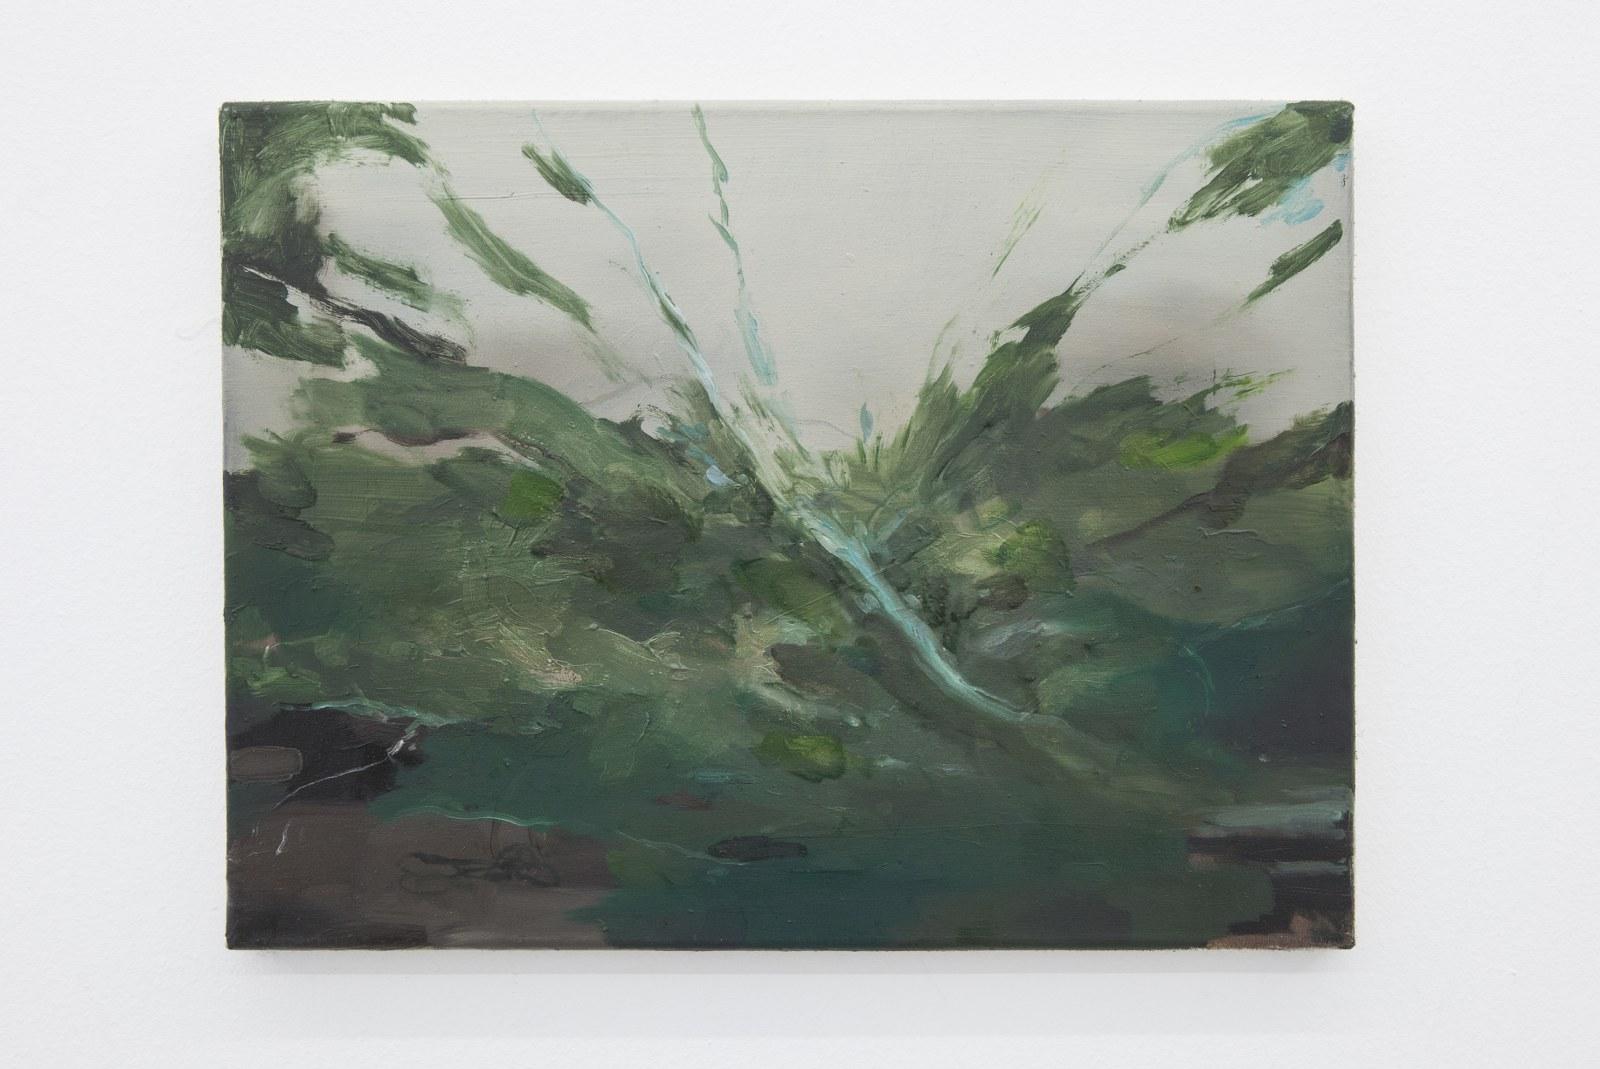 005 - NPM - Sussidiario - oil on canvas - 30x40cm - 2015